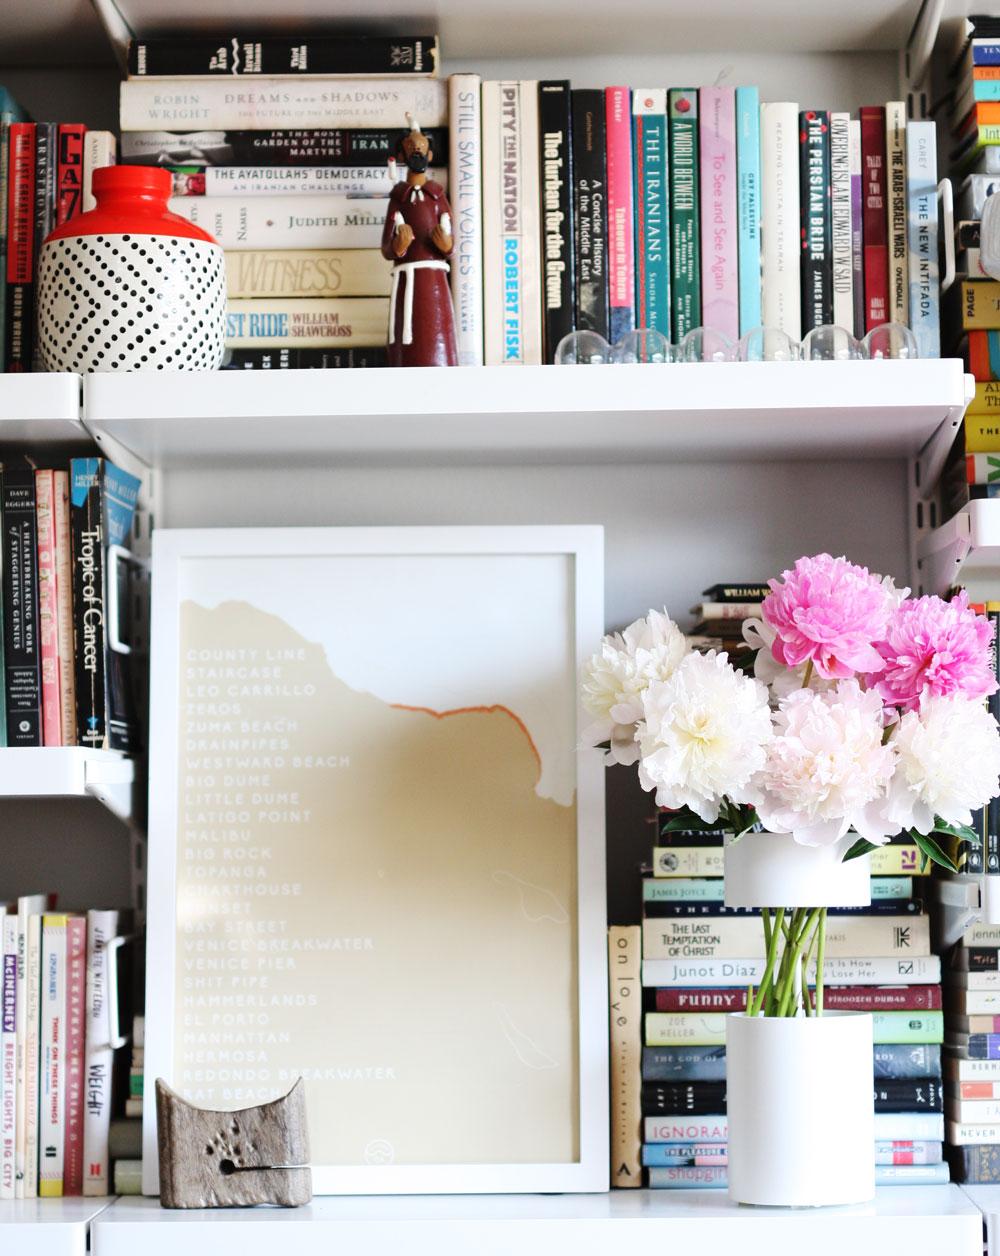 jestcafe.com-bookshelves33